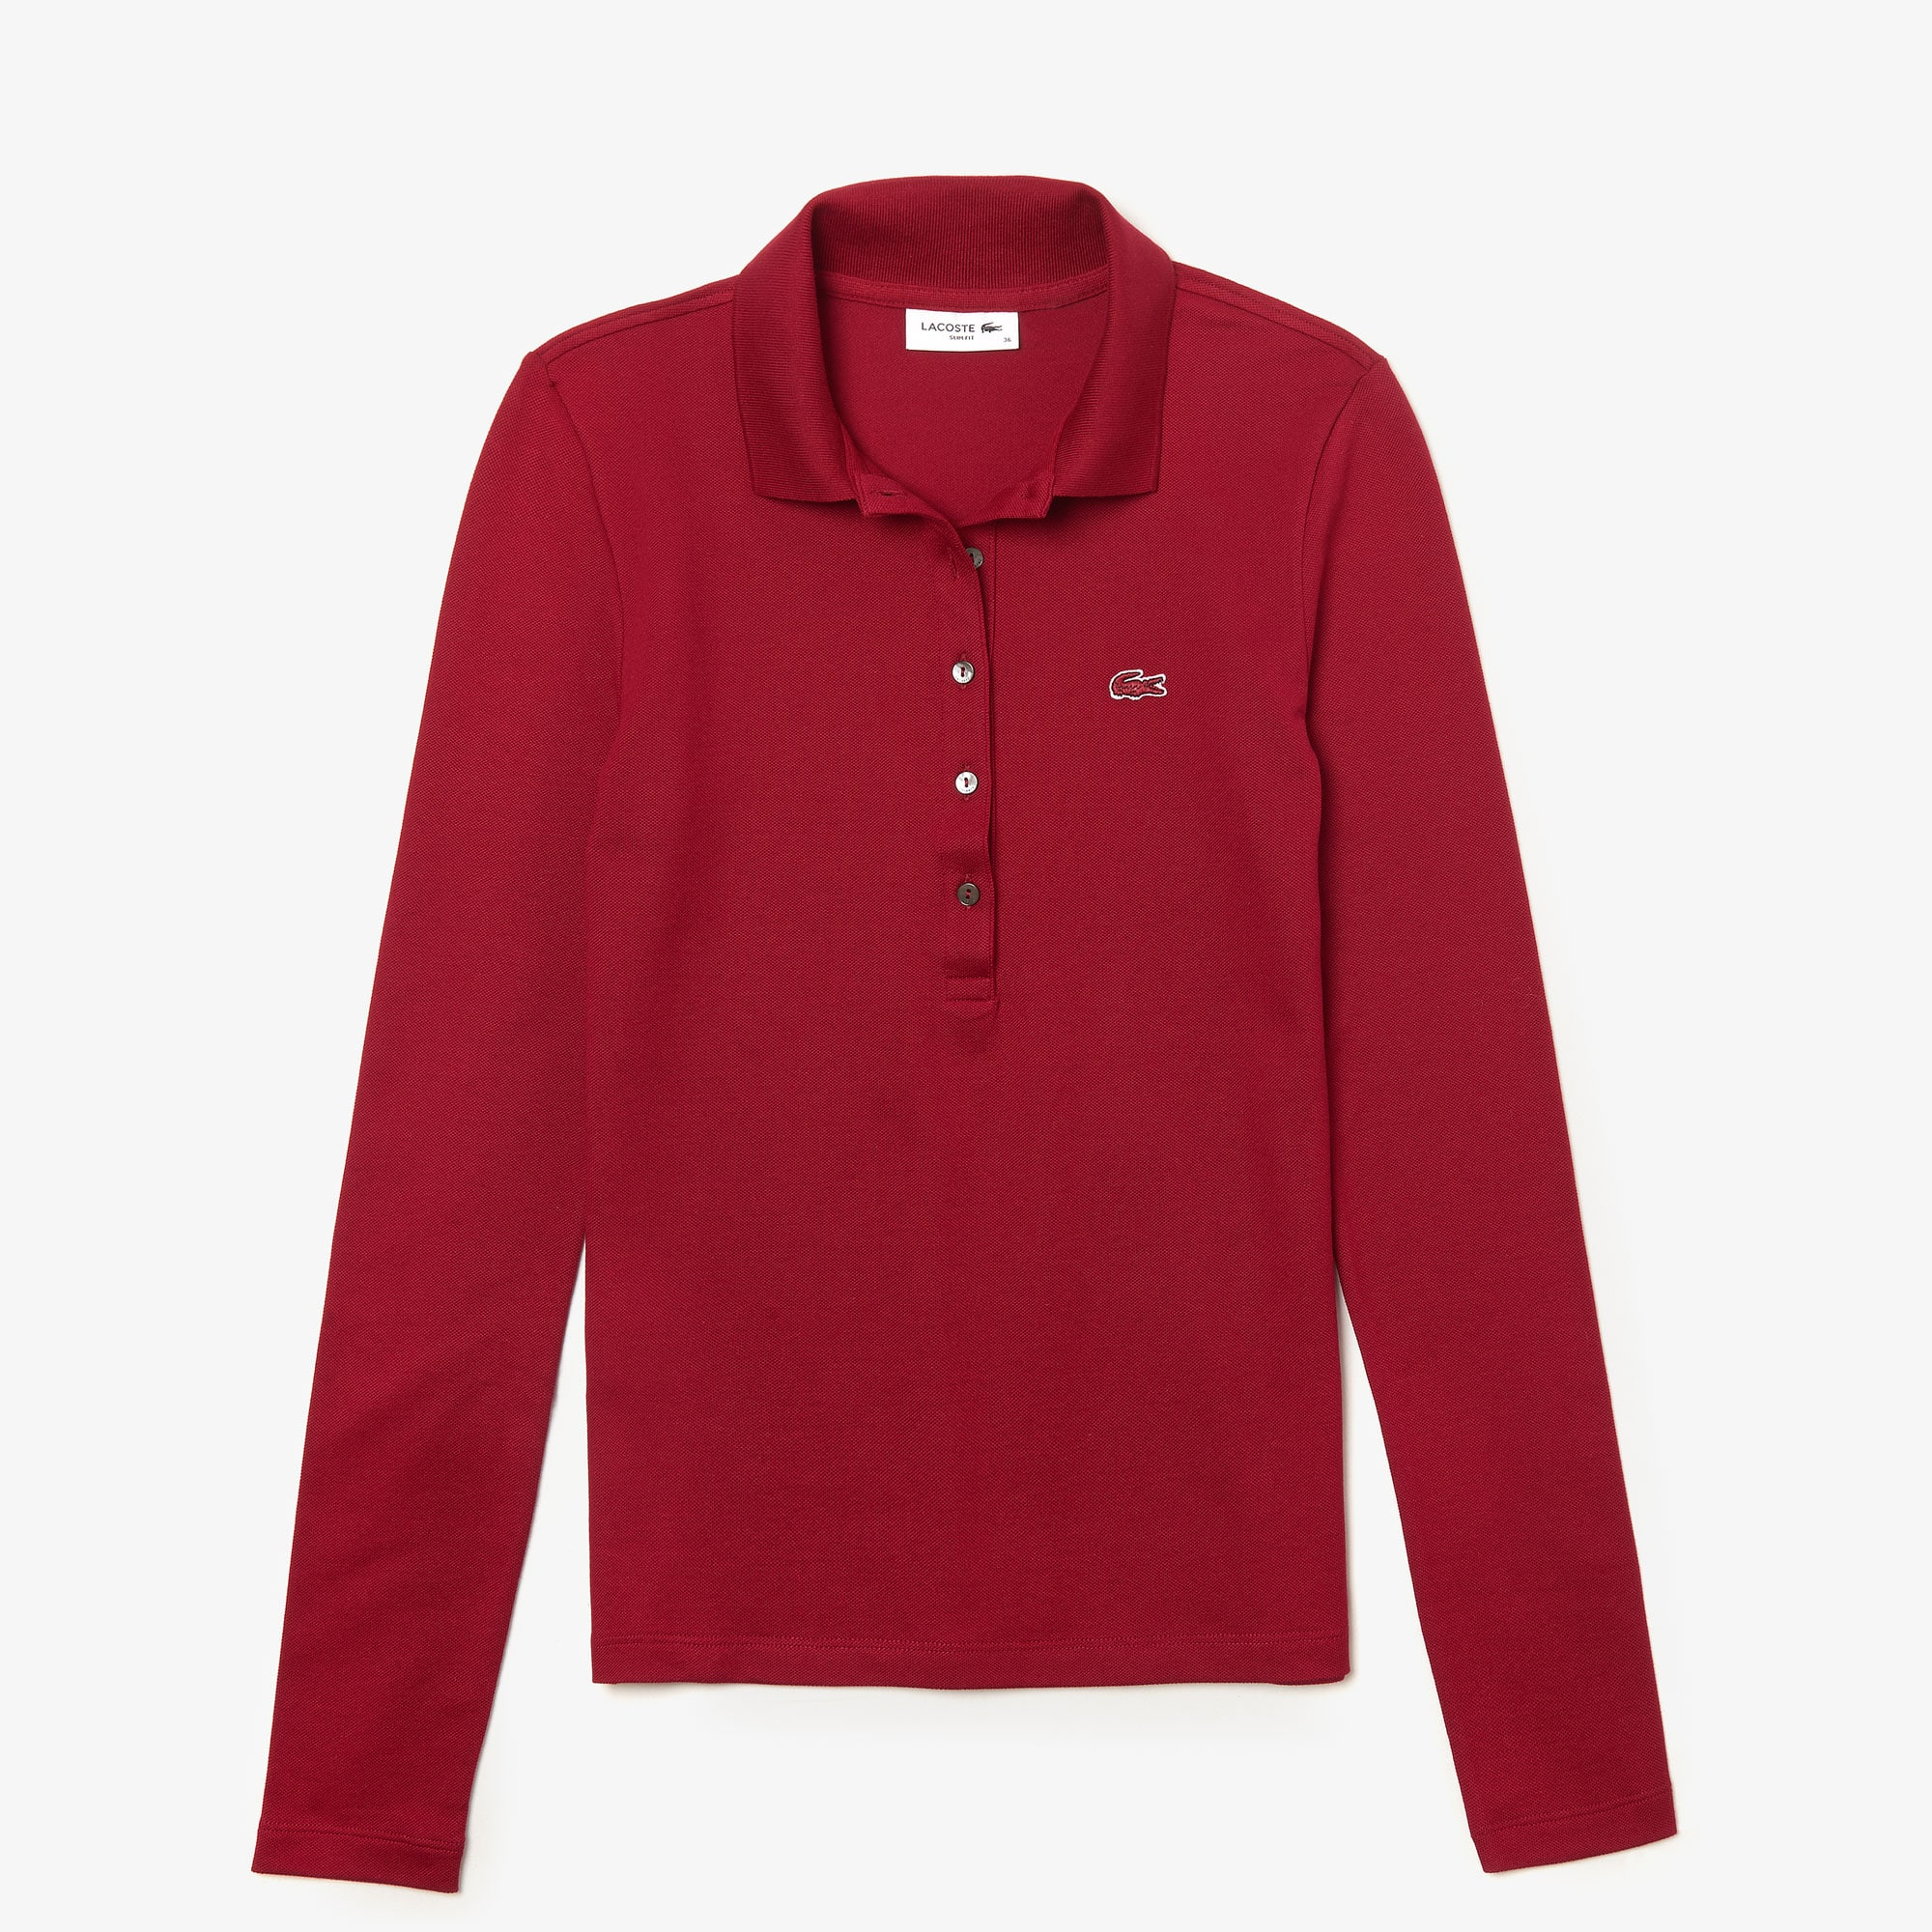 78b2dcd49475 Women's Lacoste Slim Fit Stretch Mini Piqué Polo Shirt